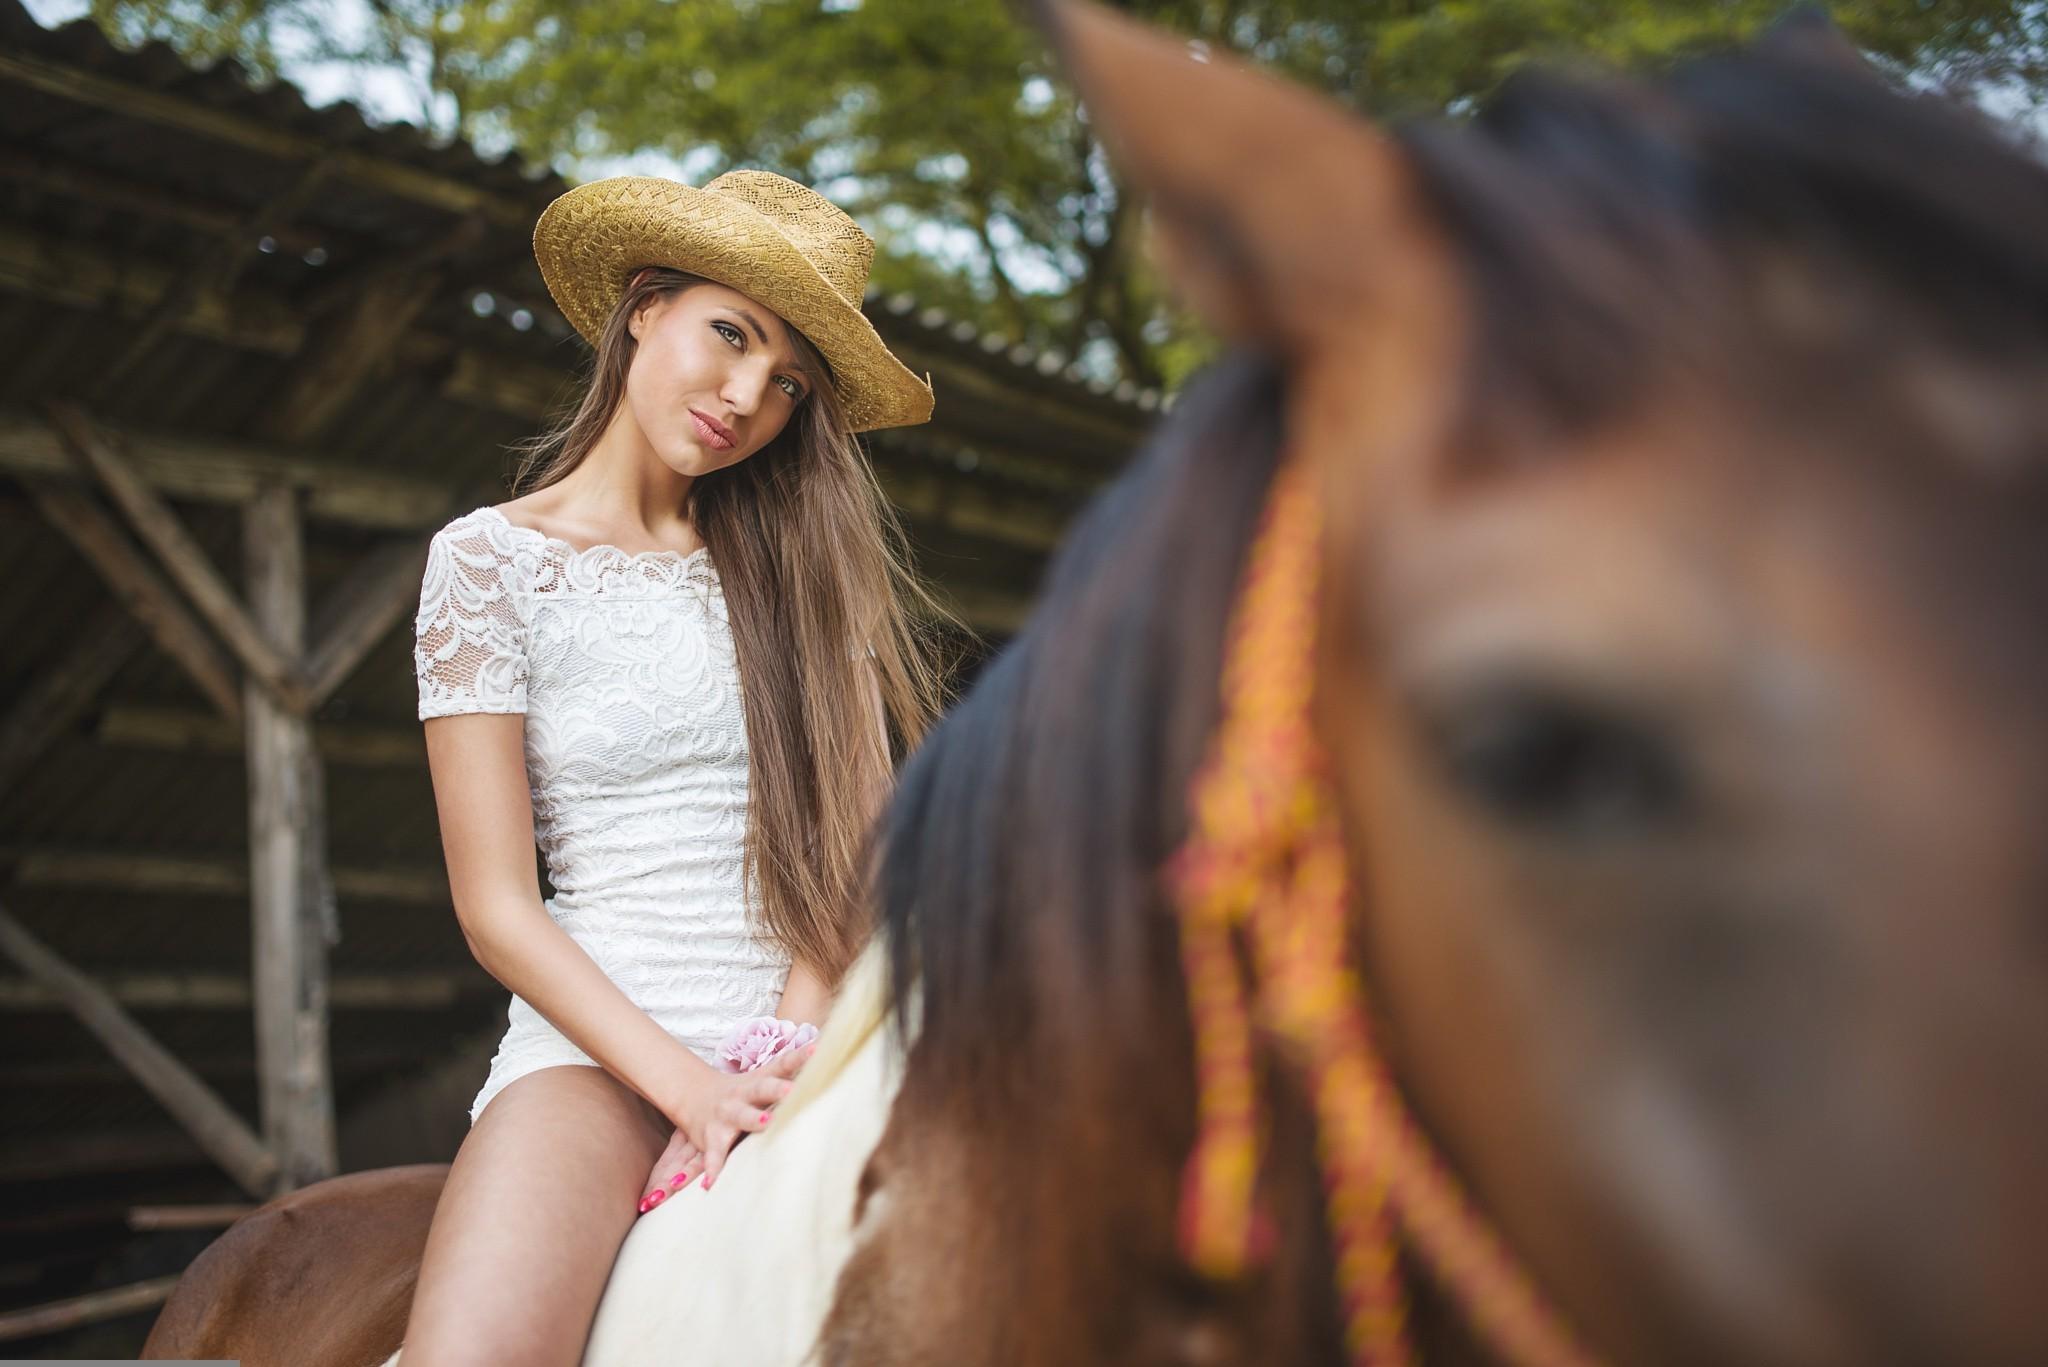 голые девушки и лошади обои